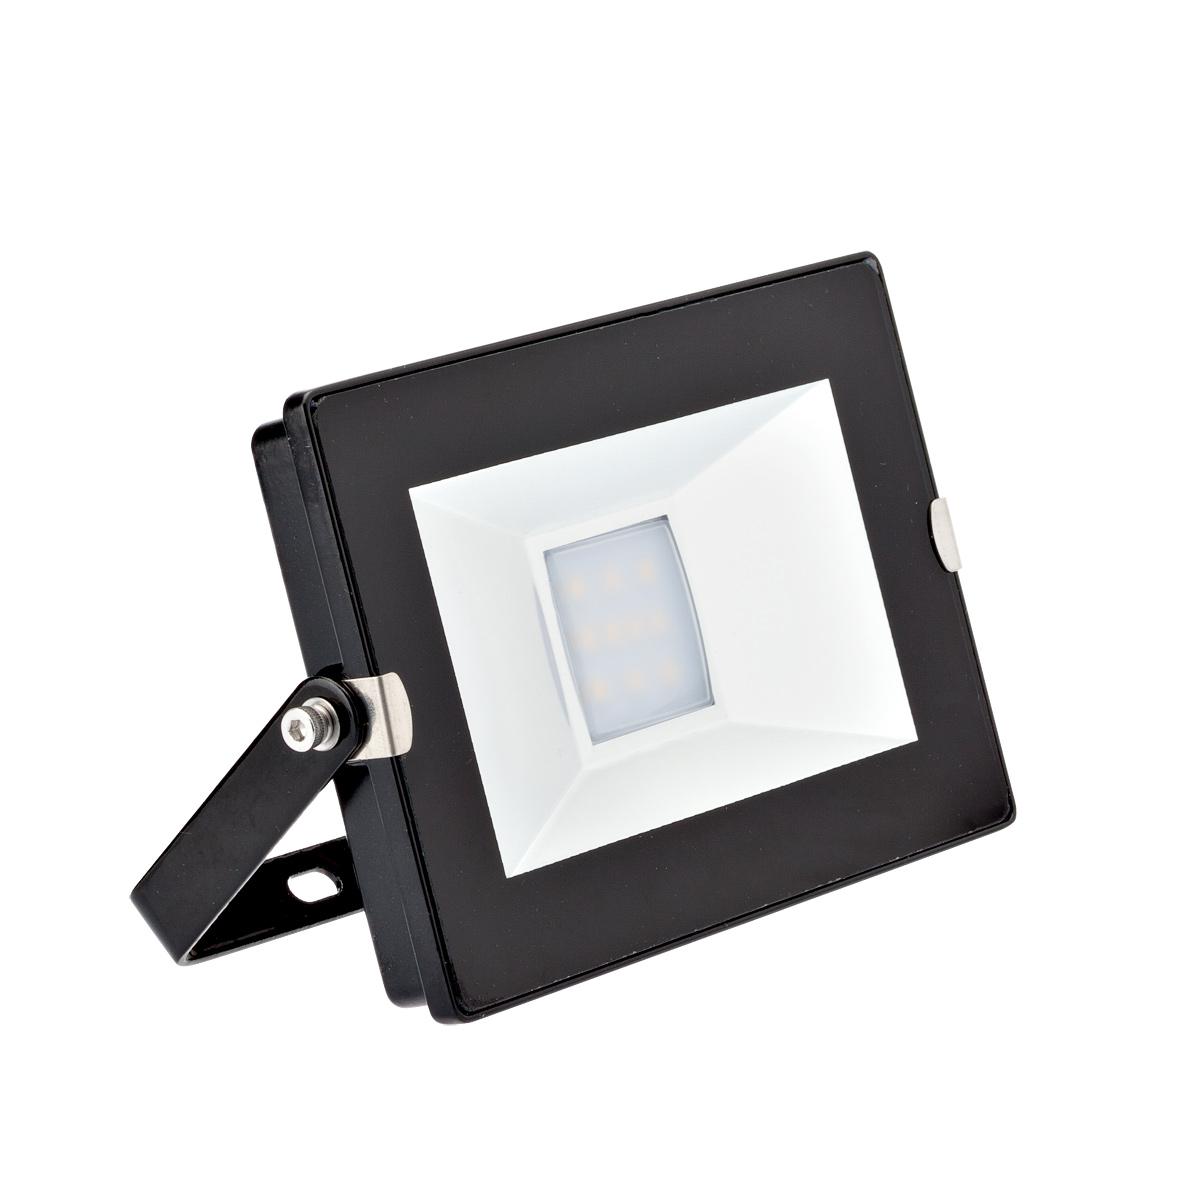 Прожектор светодиодный МАЯК Led-a-10w/4000 доска для объявлений dz j1a 169 led led jndx 1 s a